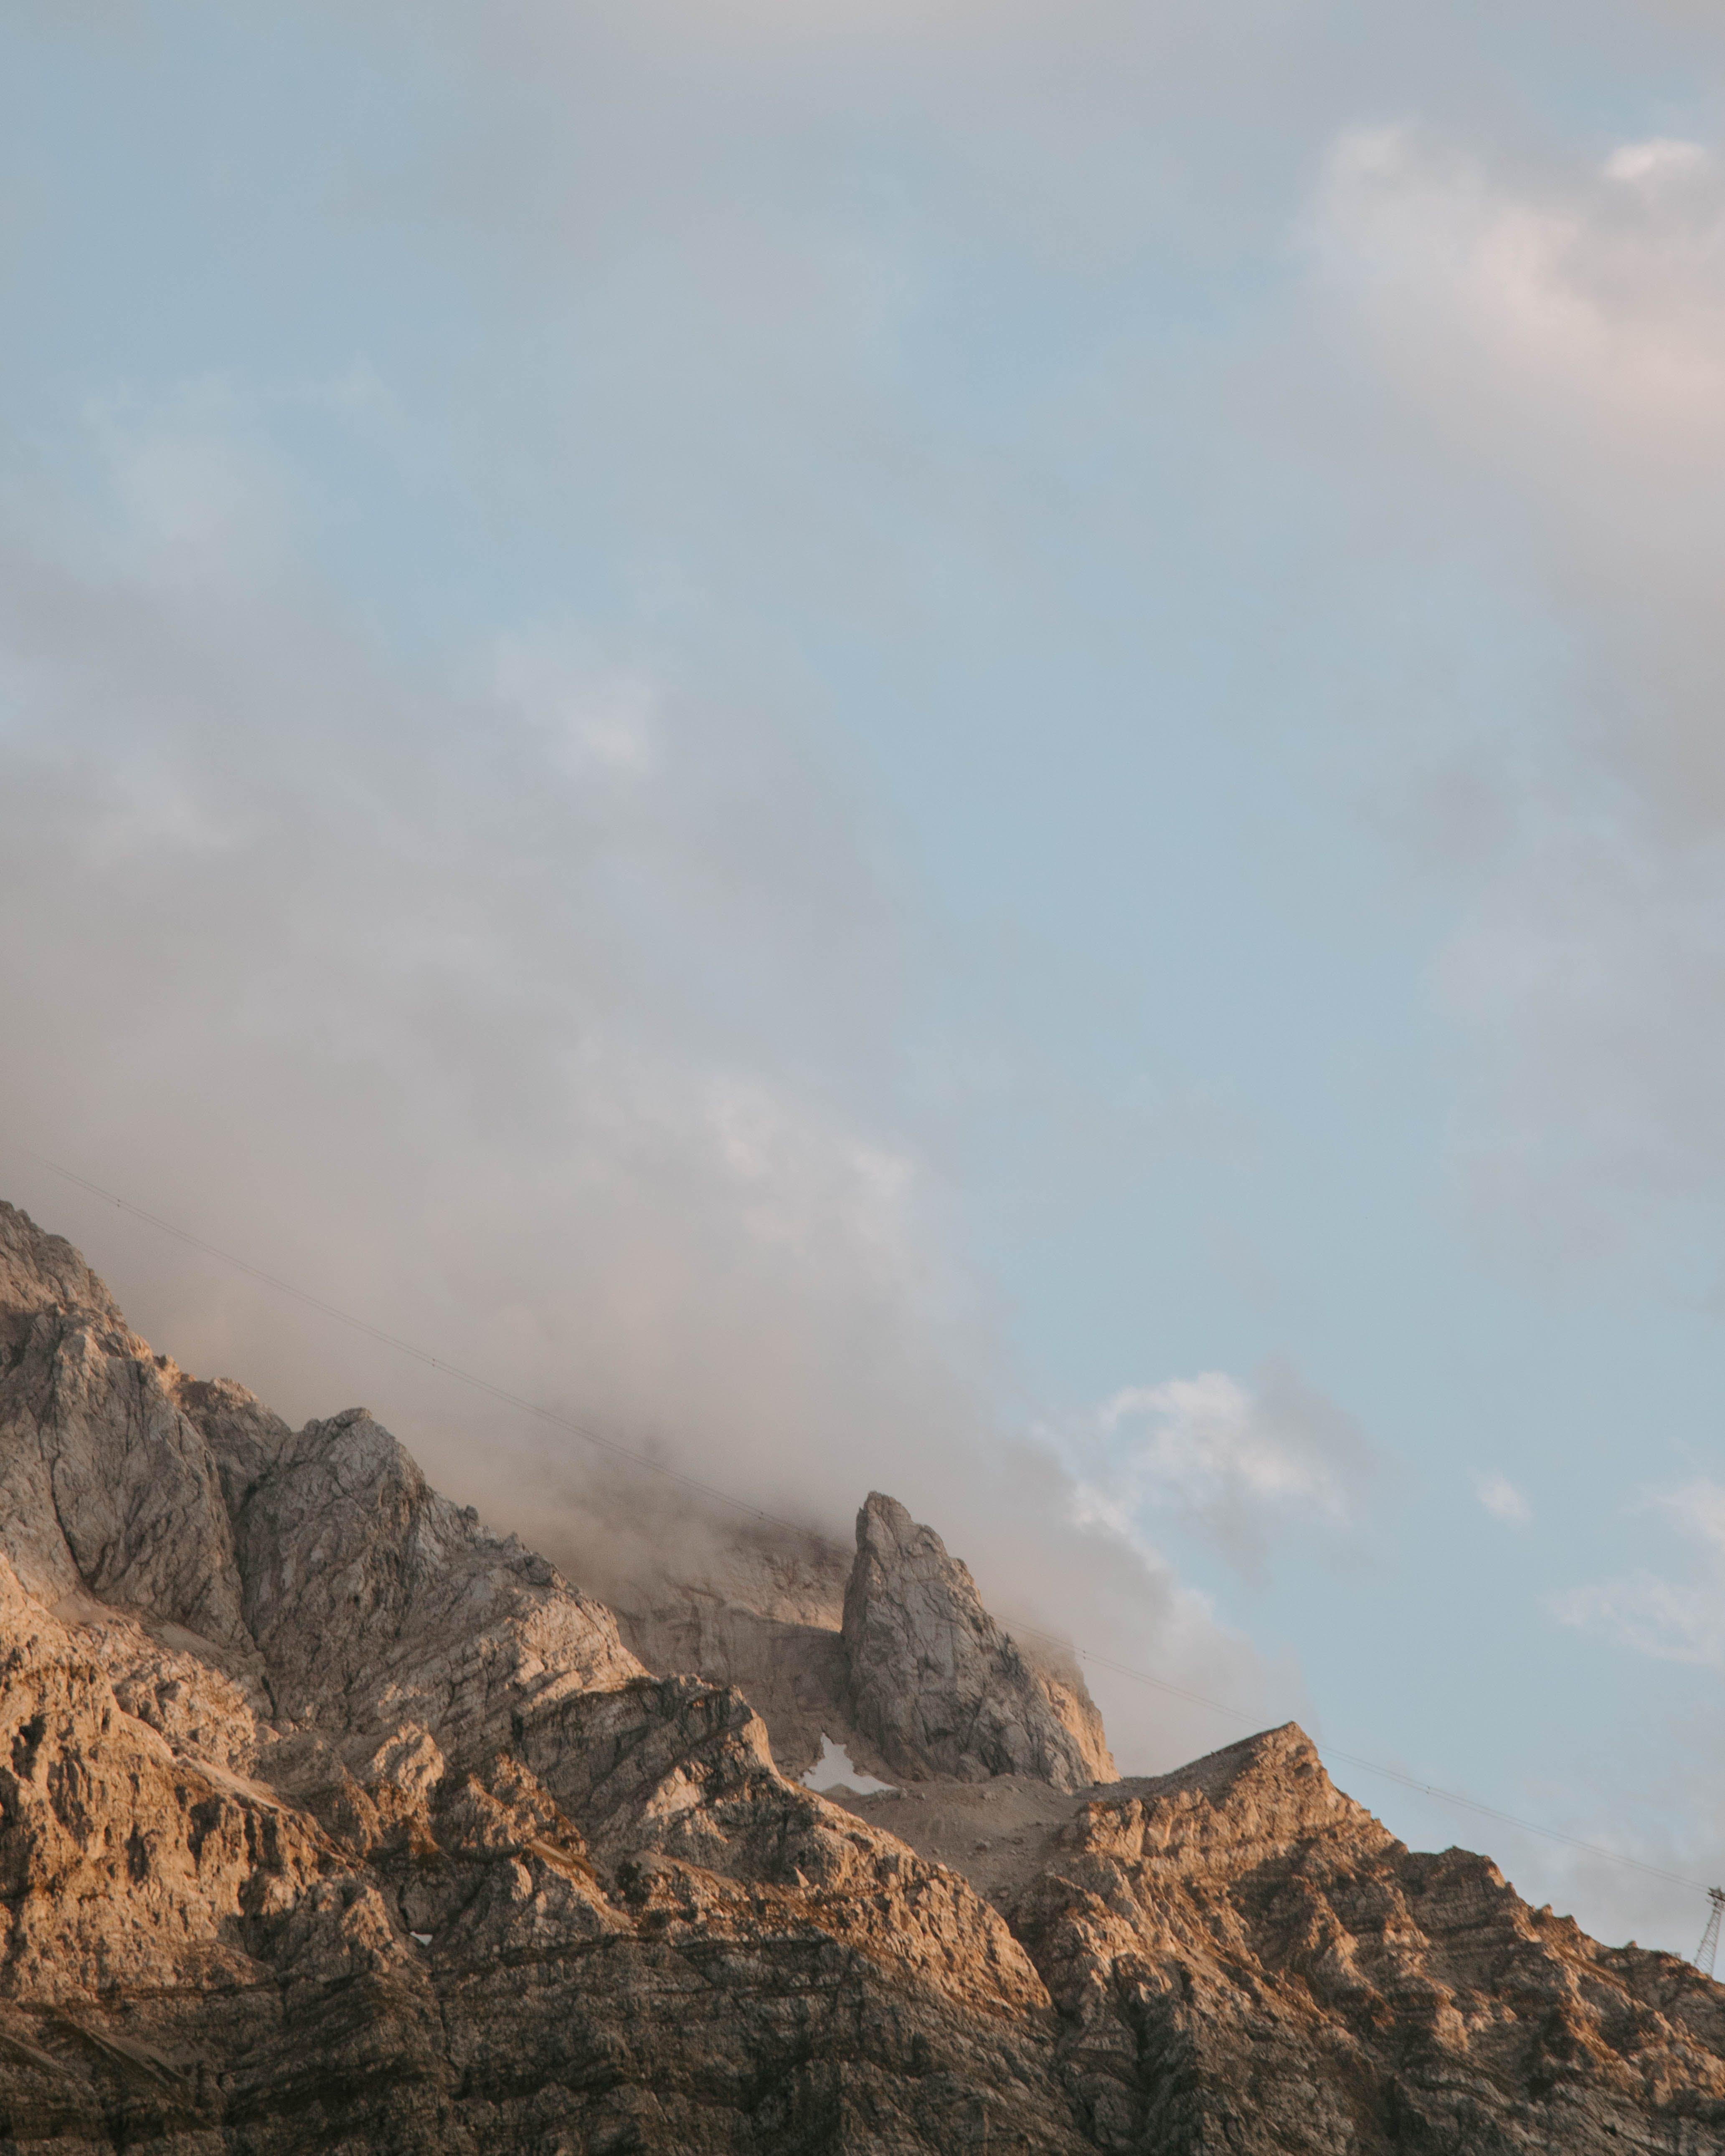 Gratis stockfoto met berg, daglicht, Duitsland, eibsee